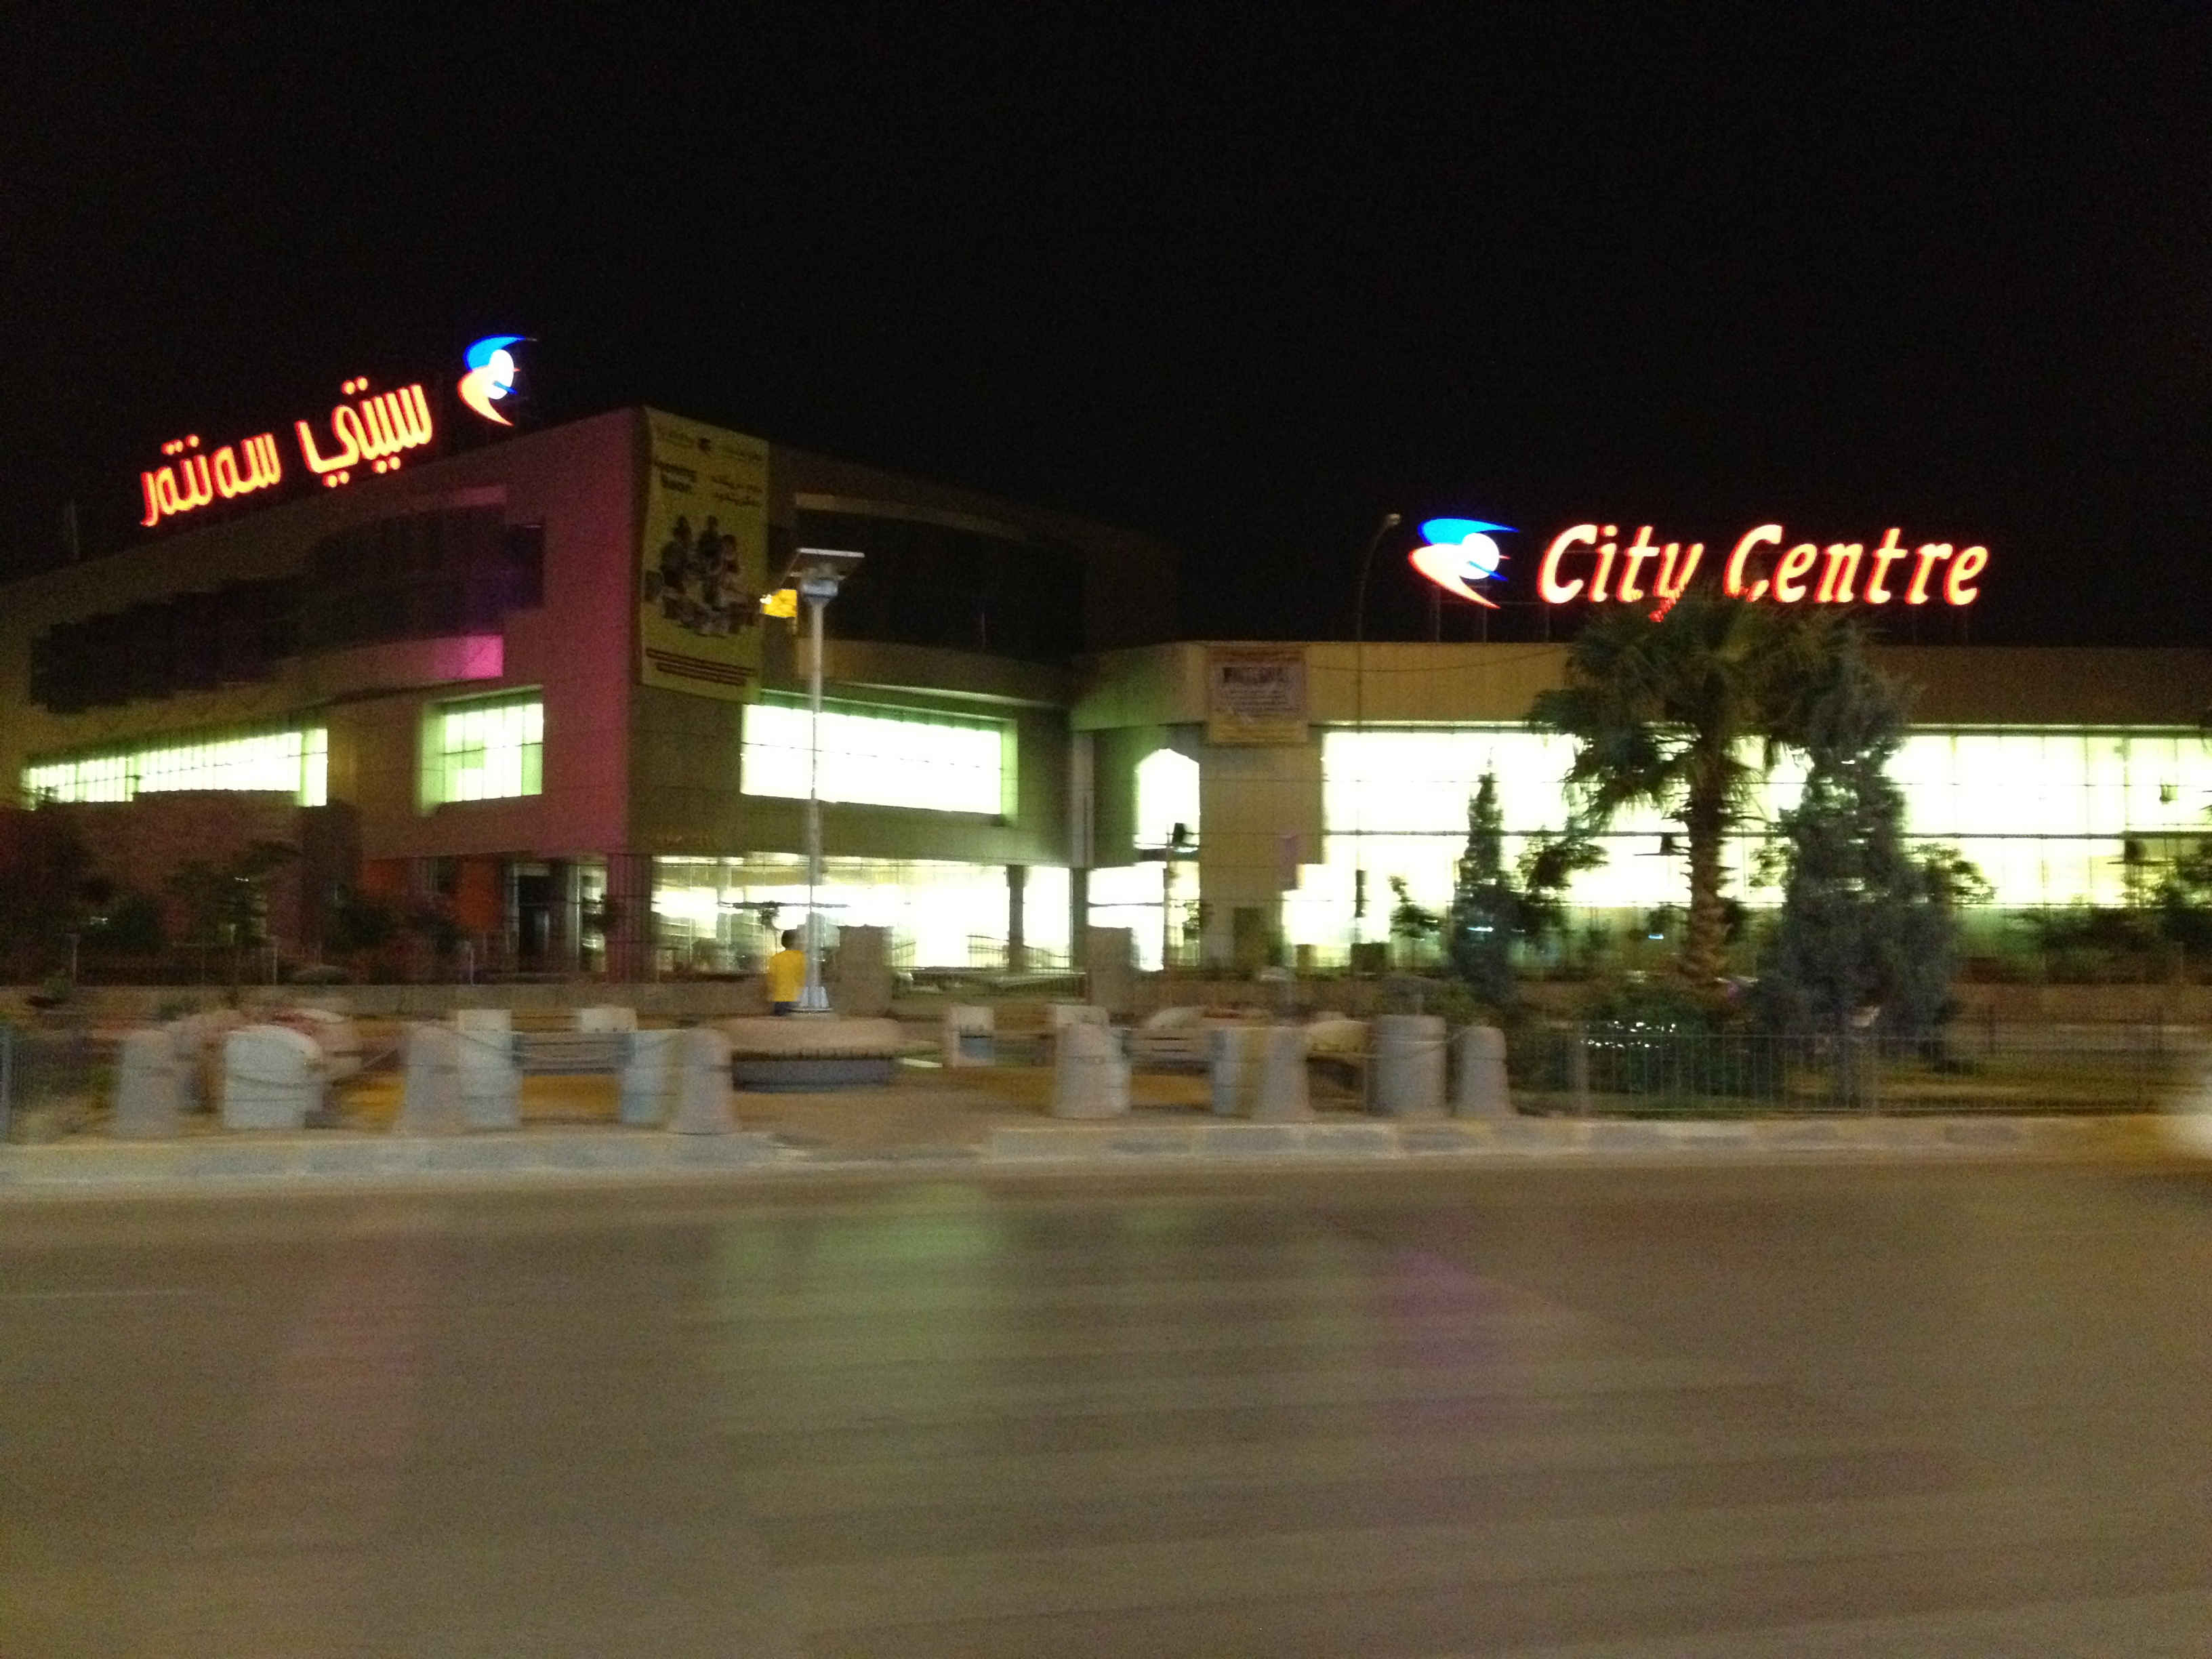 City Centre (New City) Hypermarket